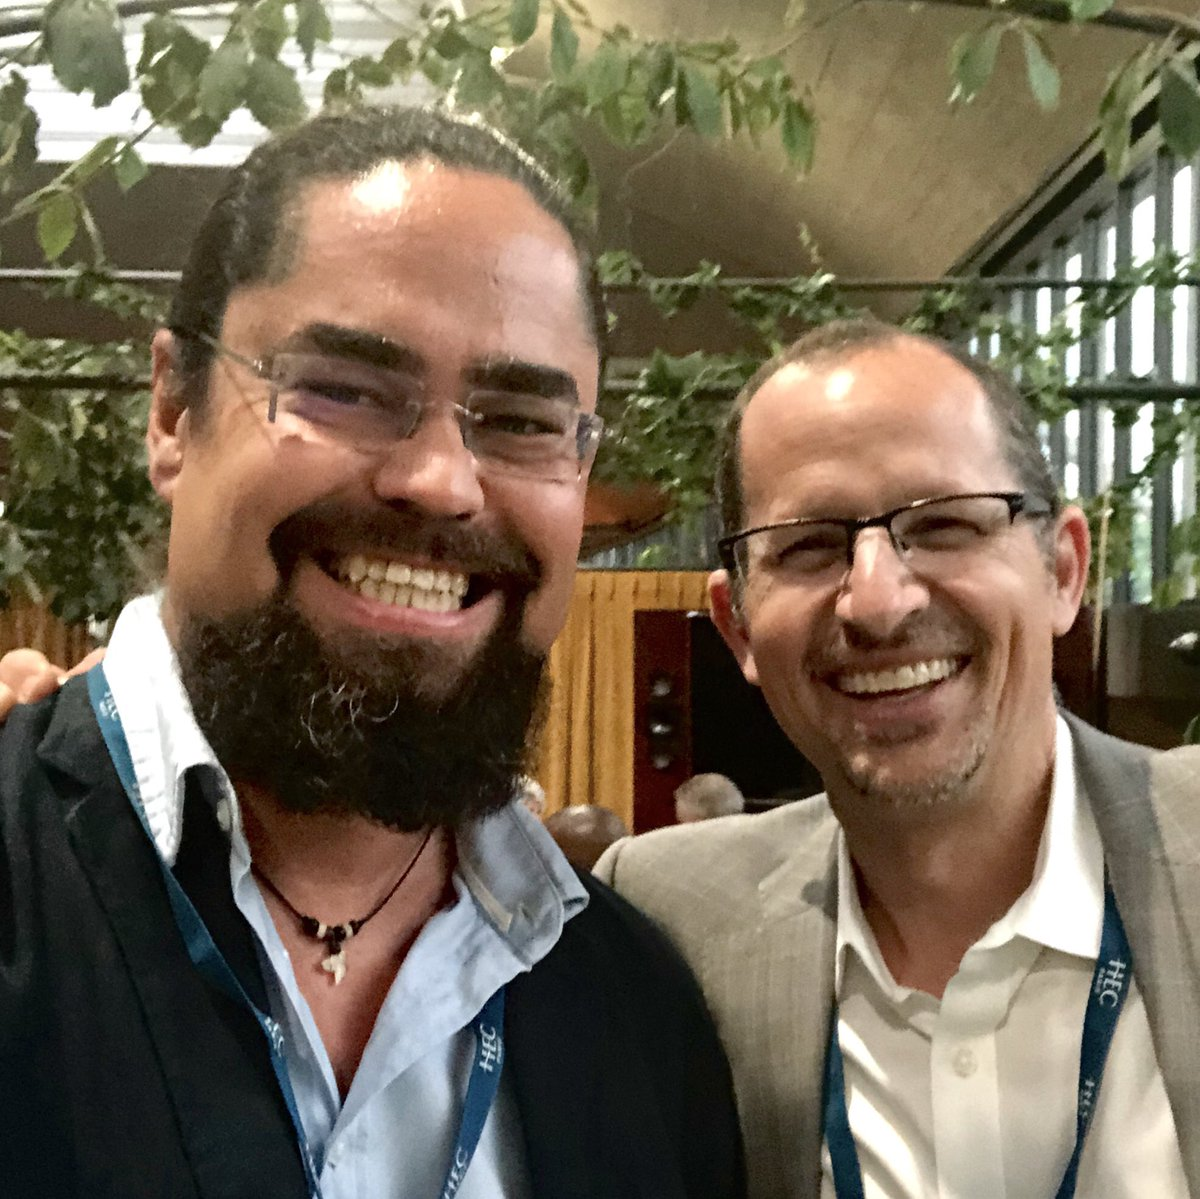 With Jeff Maggiocalda @coursera CEO merci @HECParis – at La Felicità